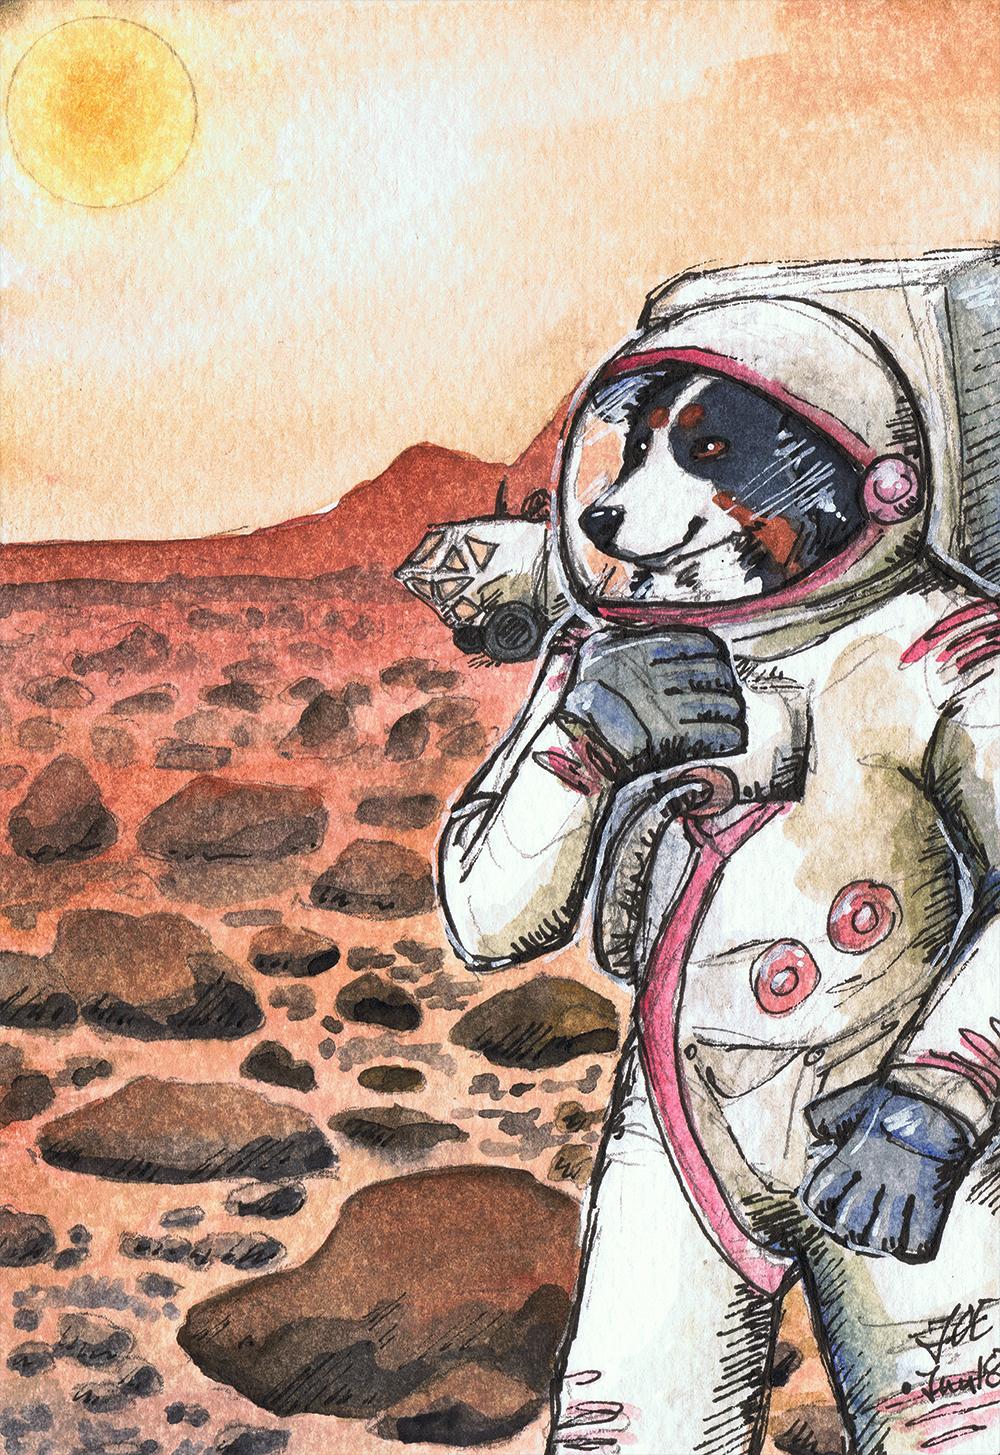 watercolor - CJ's Martian Berni